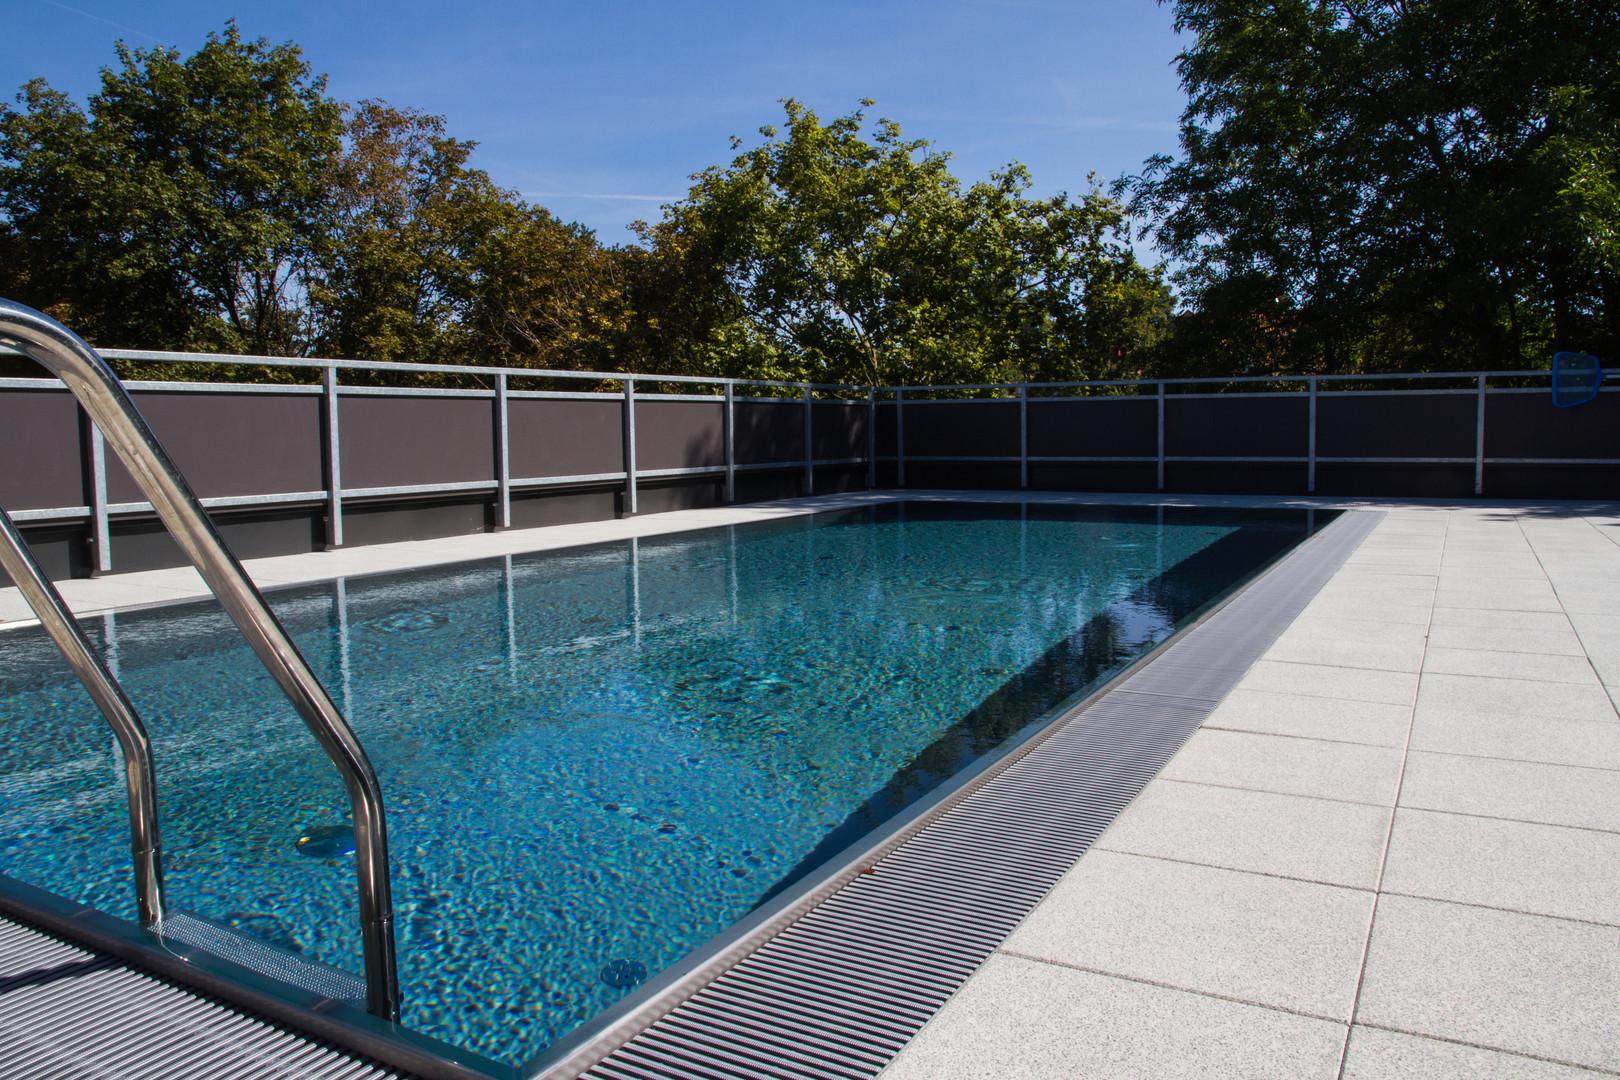 Wohnhausanlage Mistelpromenade - Pool.jp